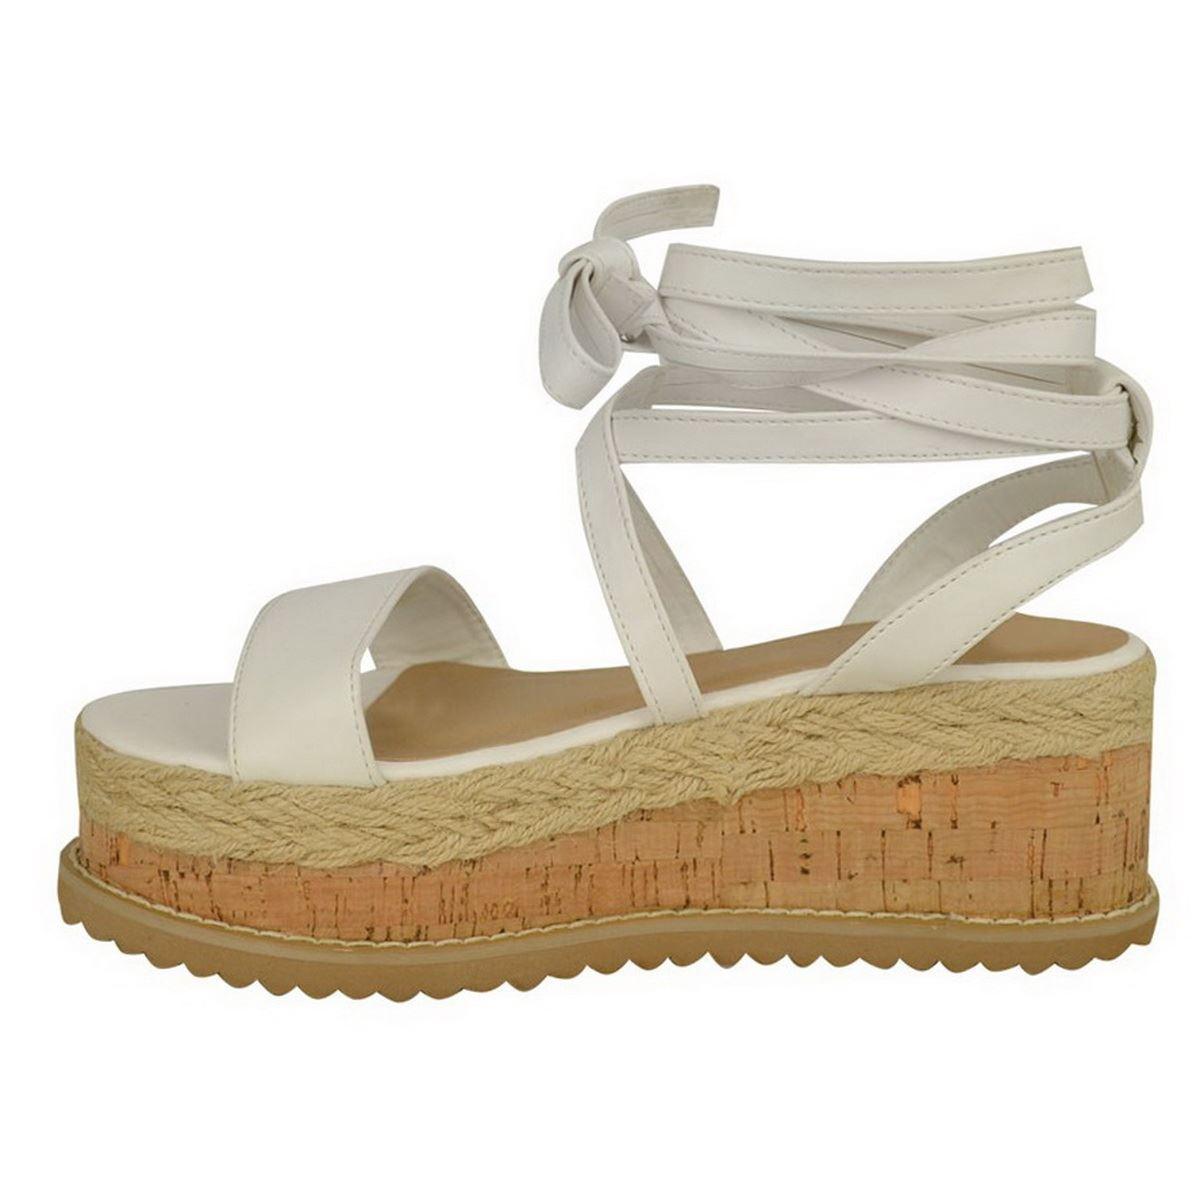 Damen Flach Keilabsatz Plateau Espadrille Sandalen Spitze Gebunden Sommer Schuhe